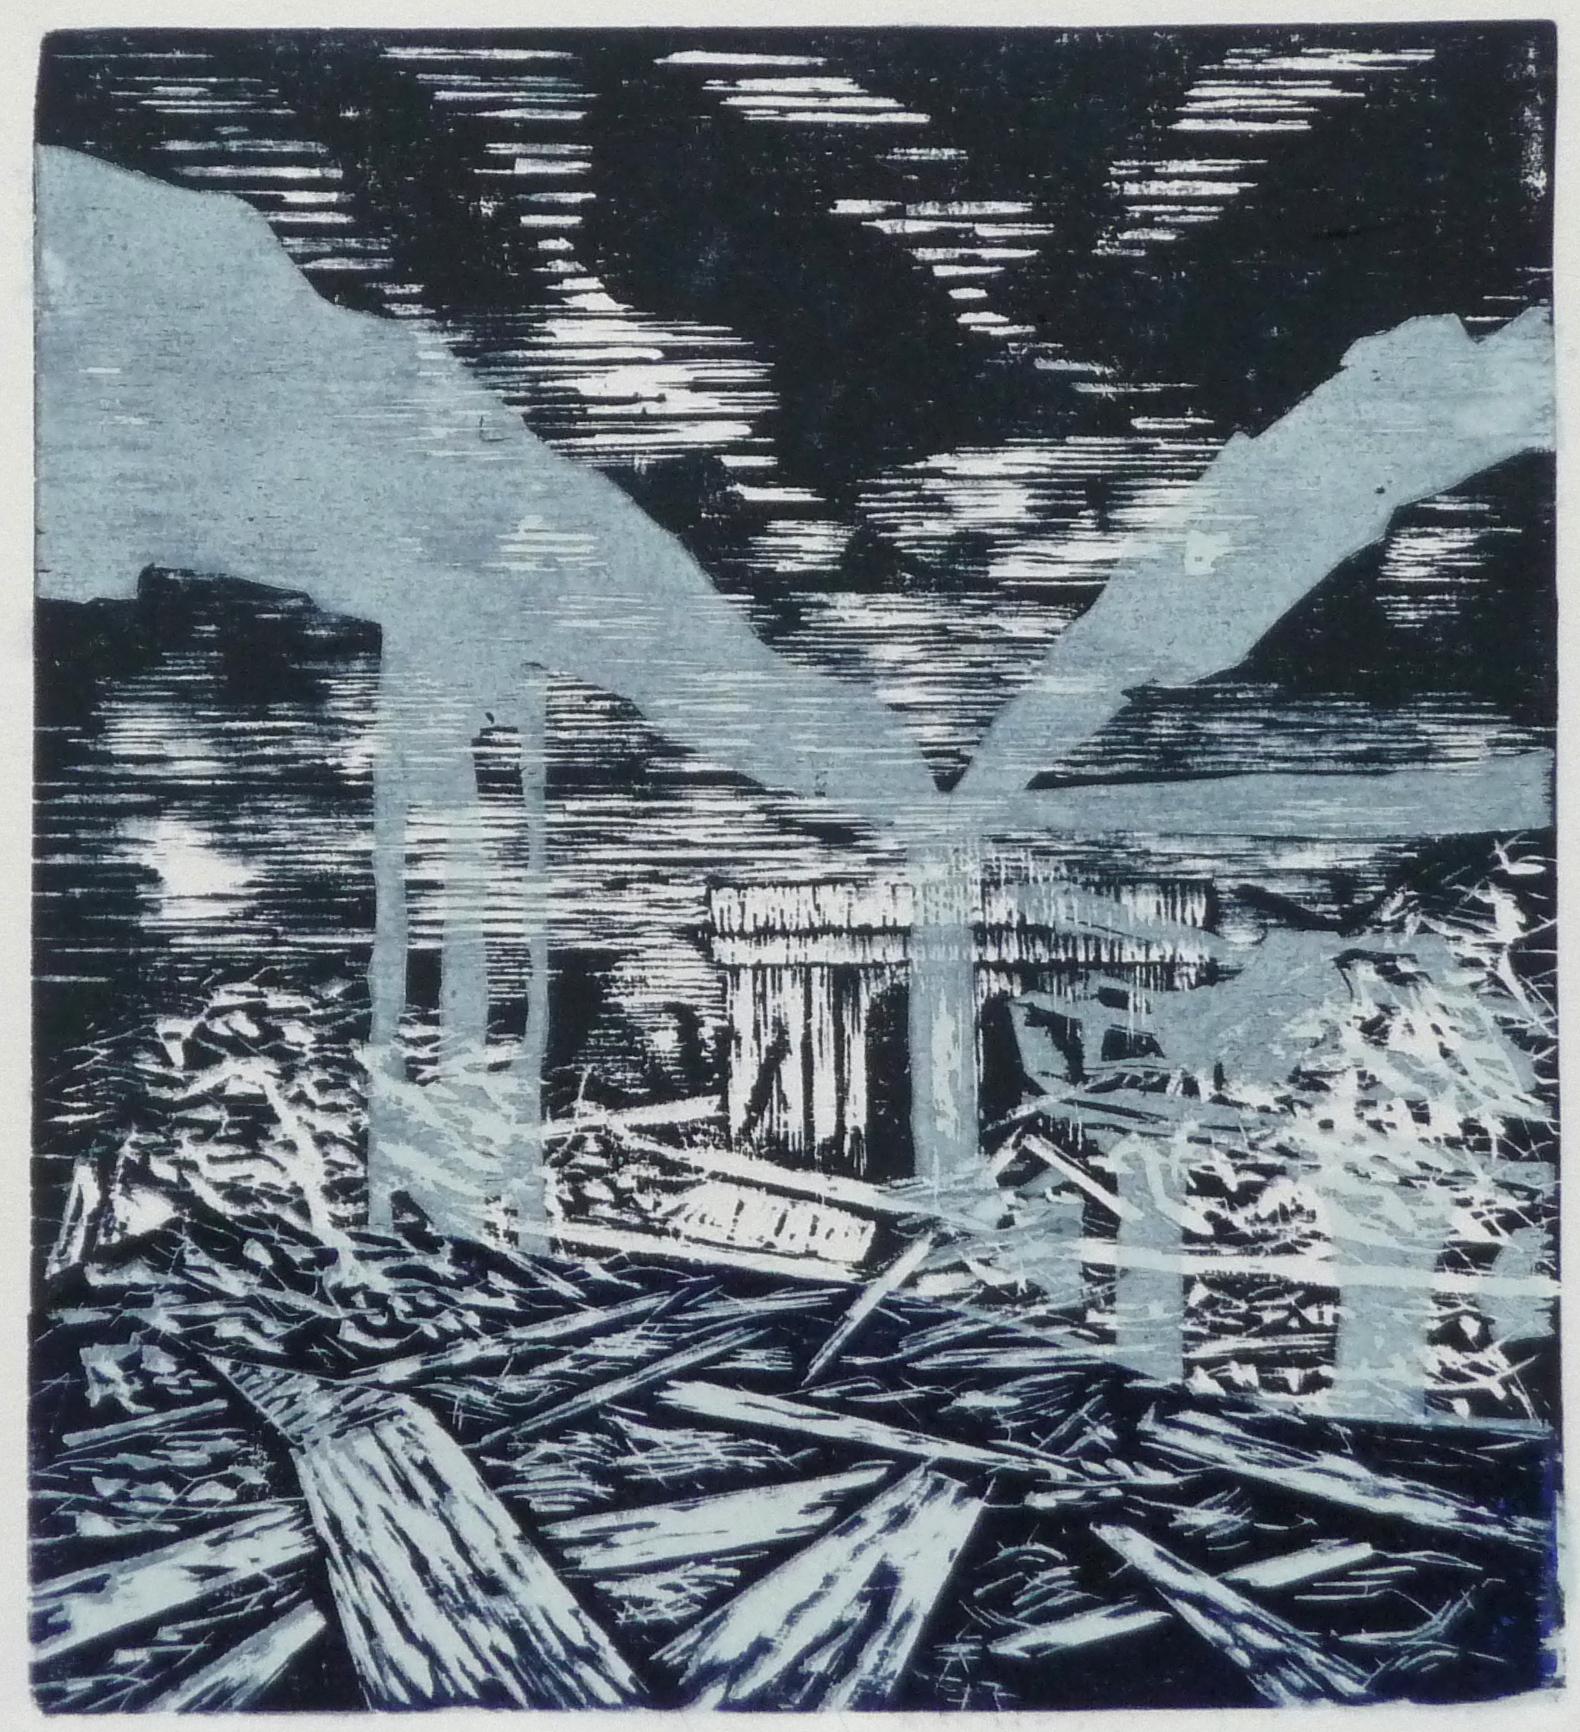 Z.t. woodcut, 24 x 26,5 cm, 2017